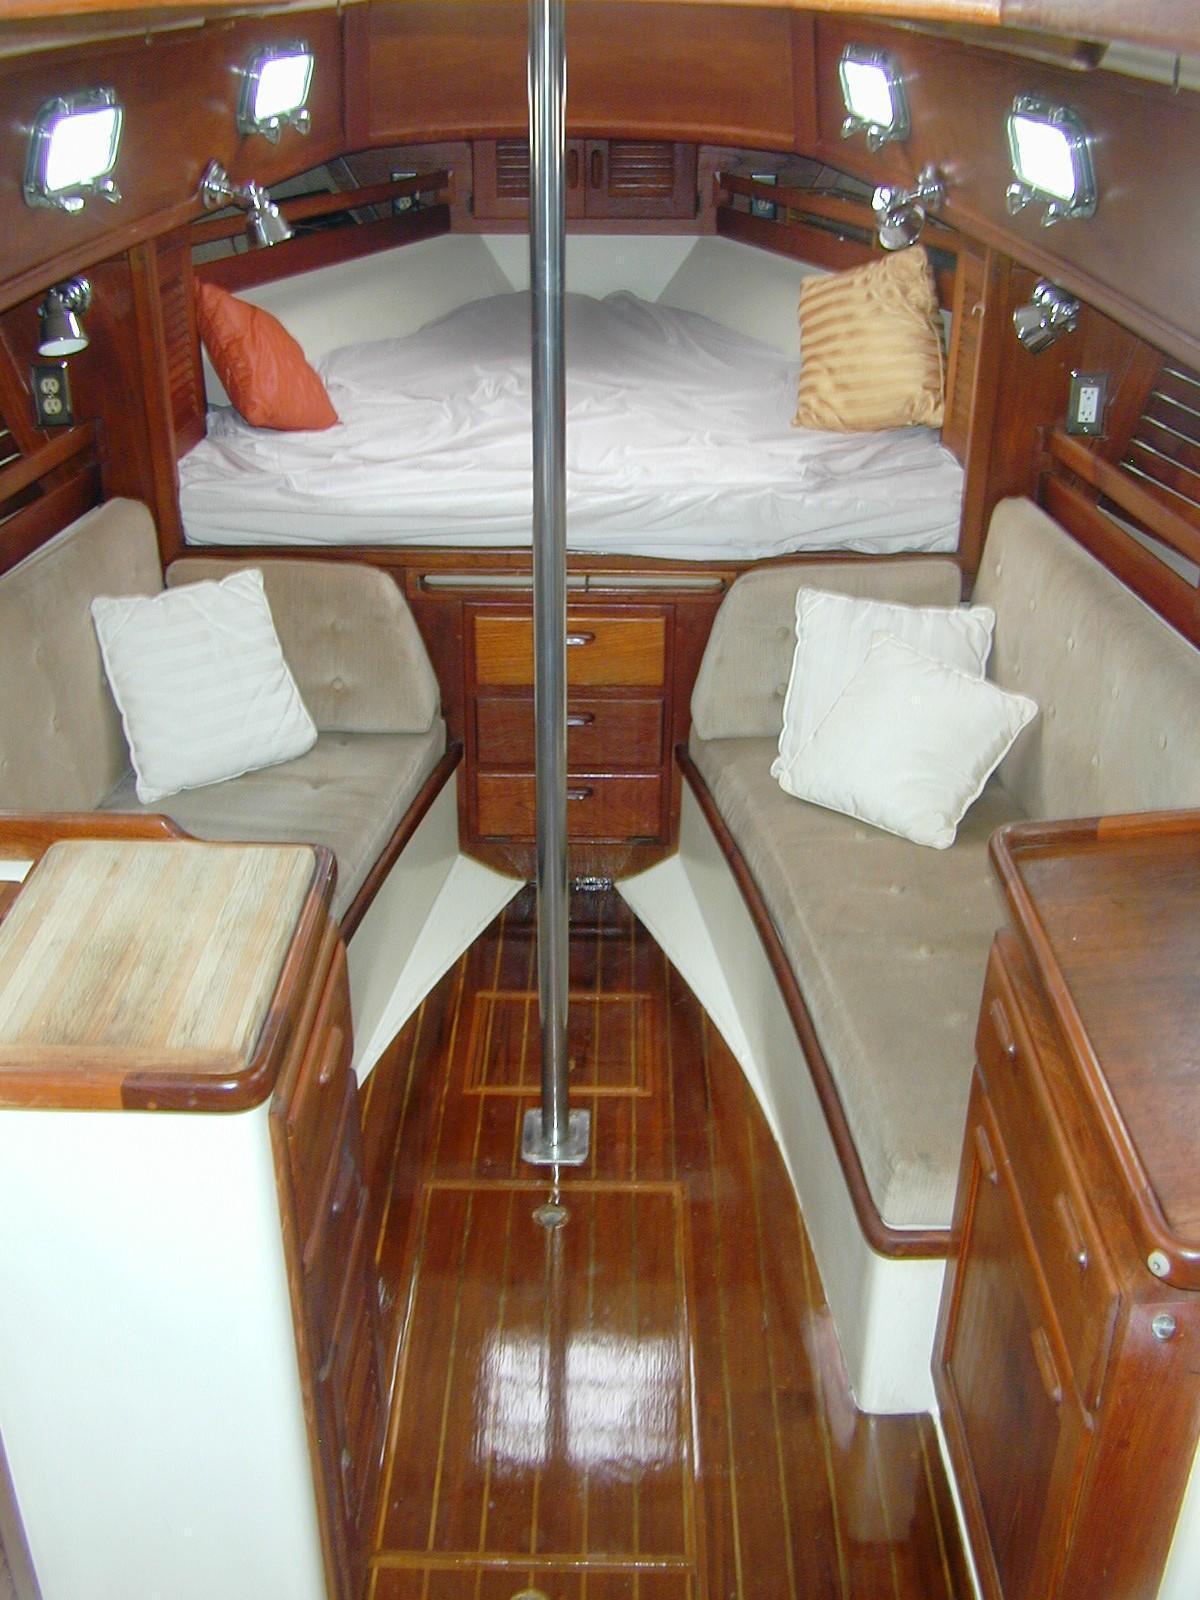 Pacific Seacraft - - Crealock design, Annapolis